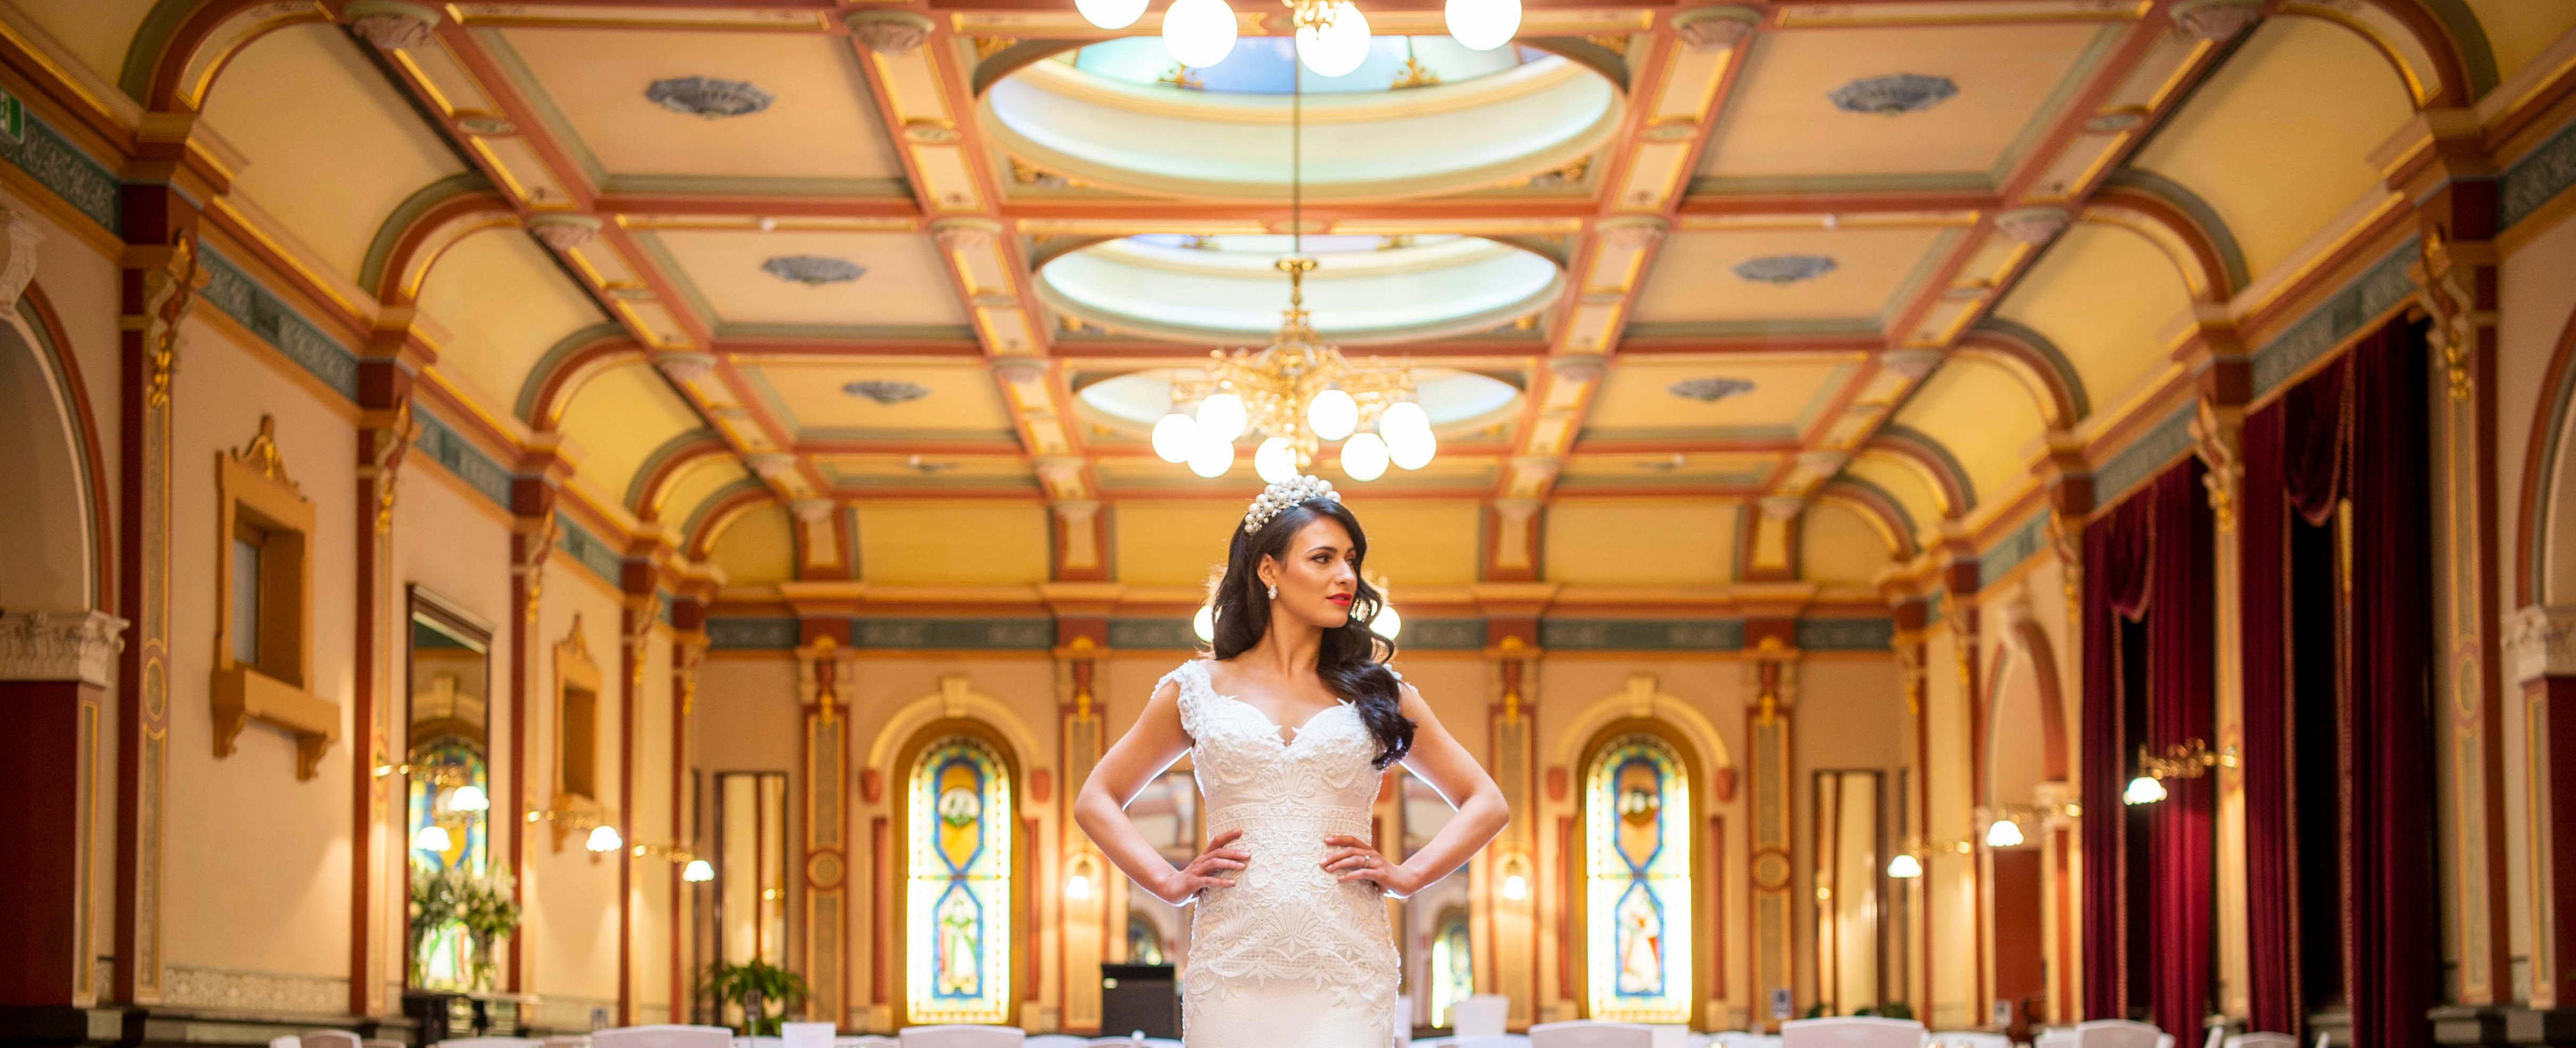 Weddings at The Hotel Windsor Melbourne